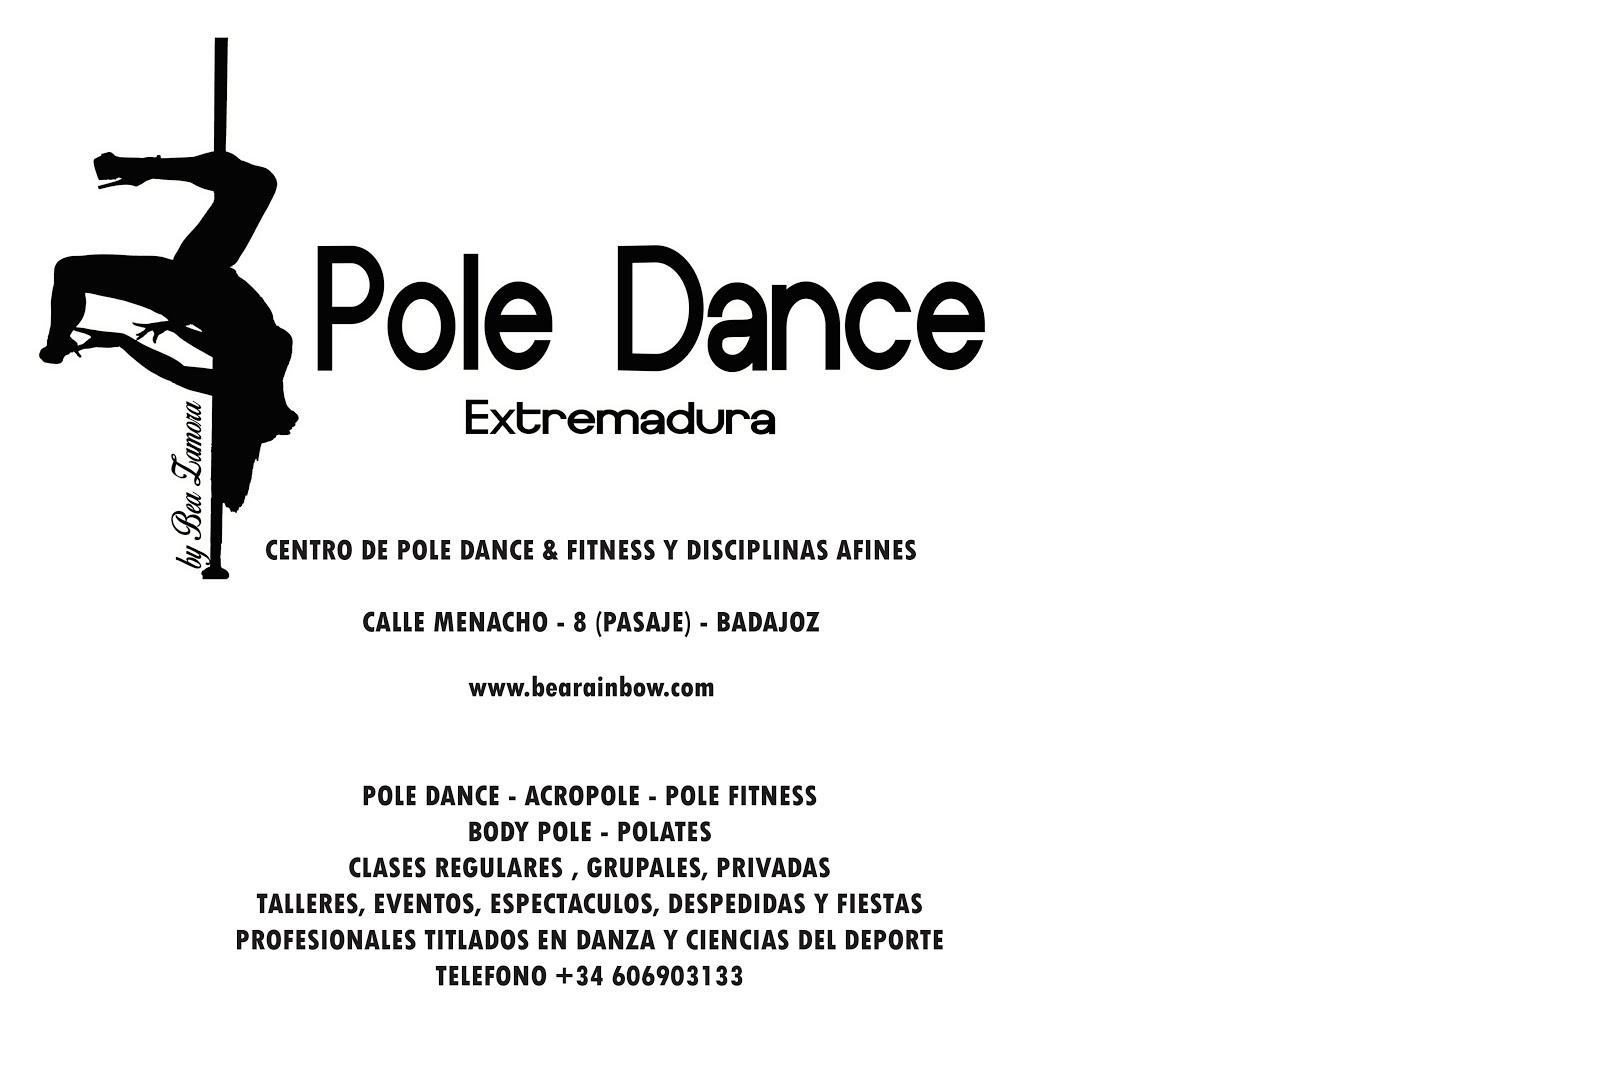 POLE DANCE & FITNESS EXTREMADURA